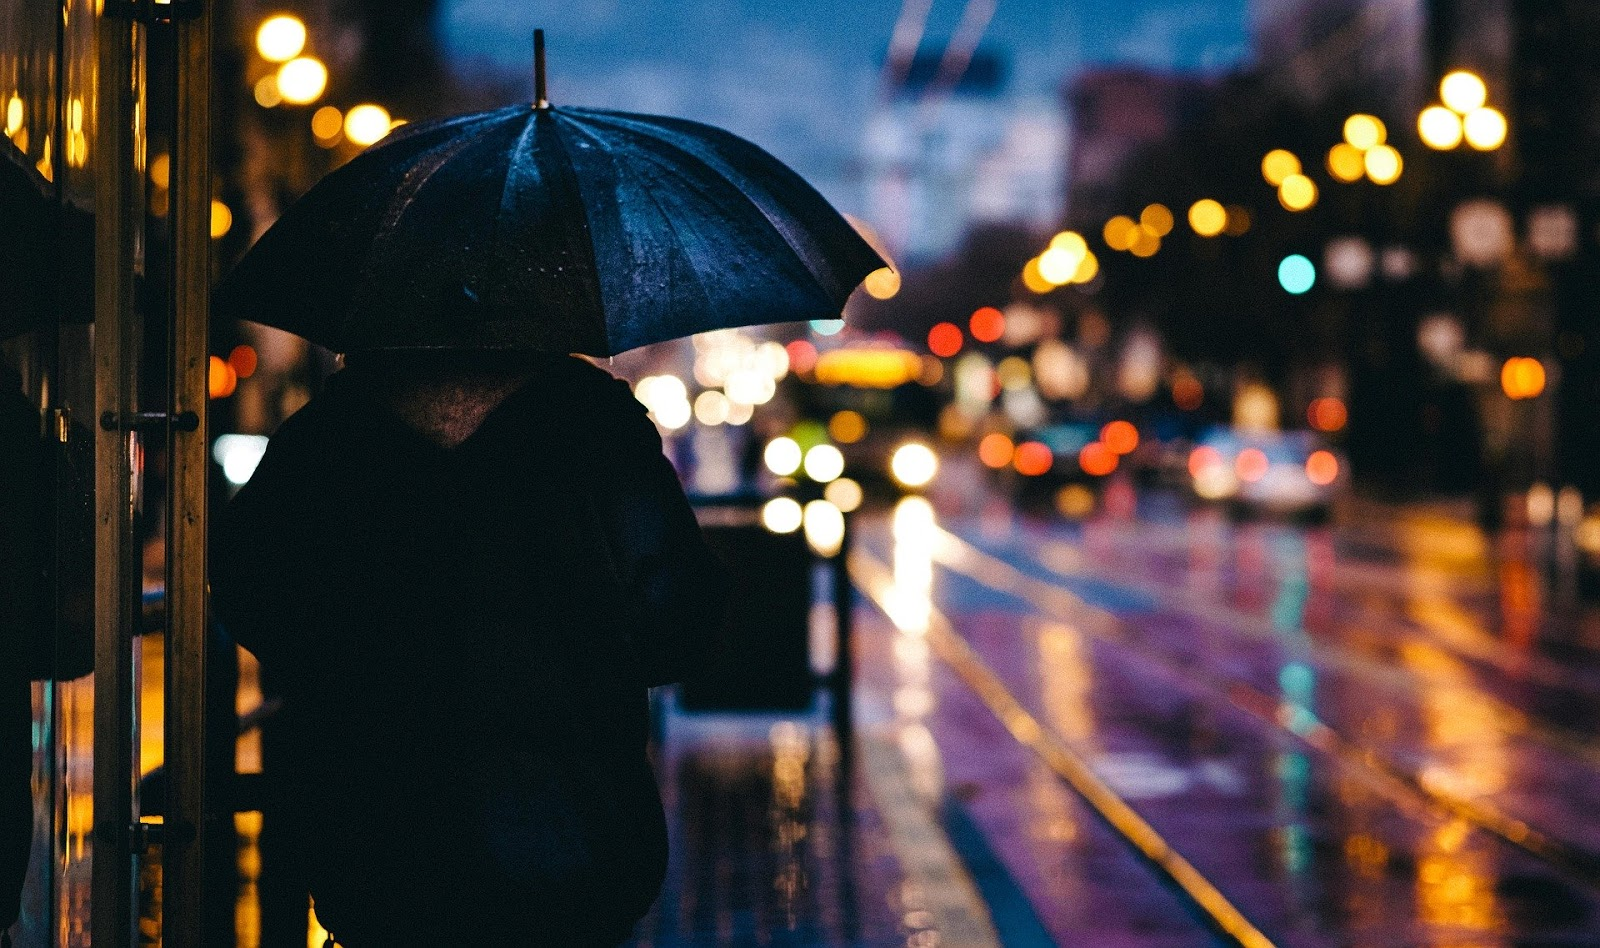 Suasana Hujan yang Menyenanglan. Cerpen